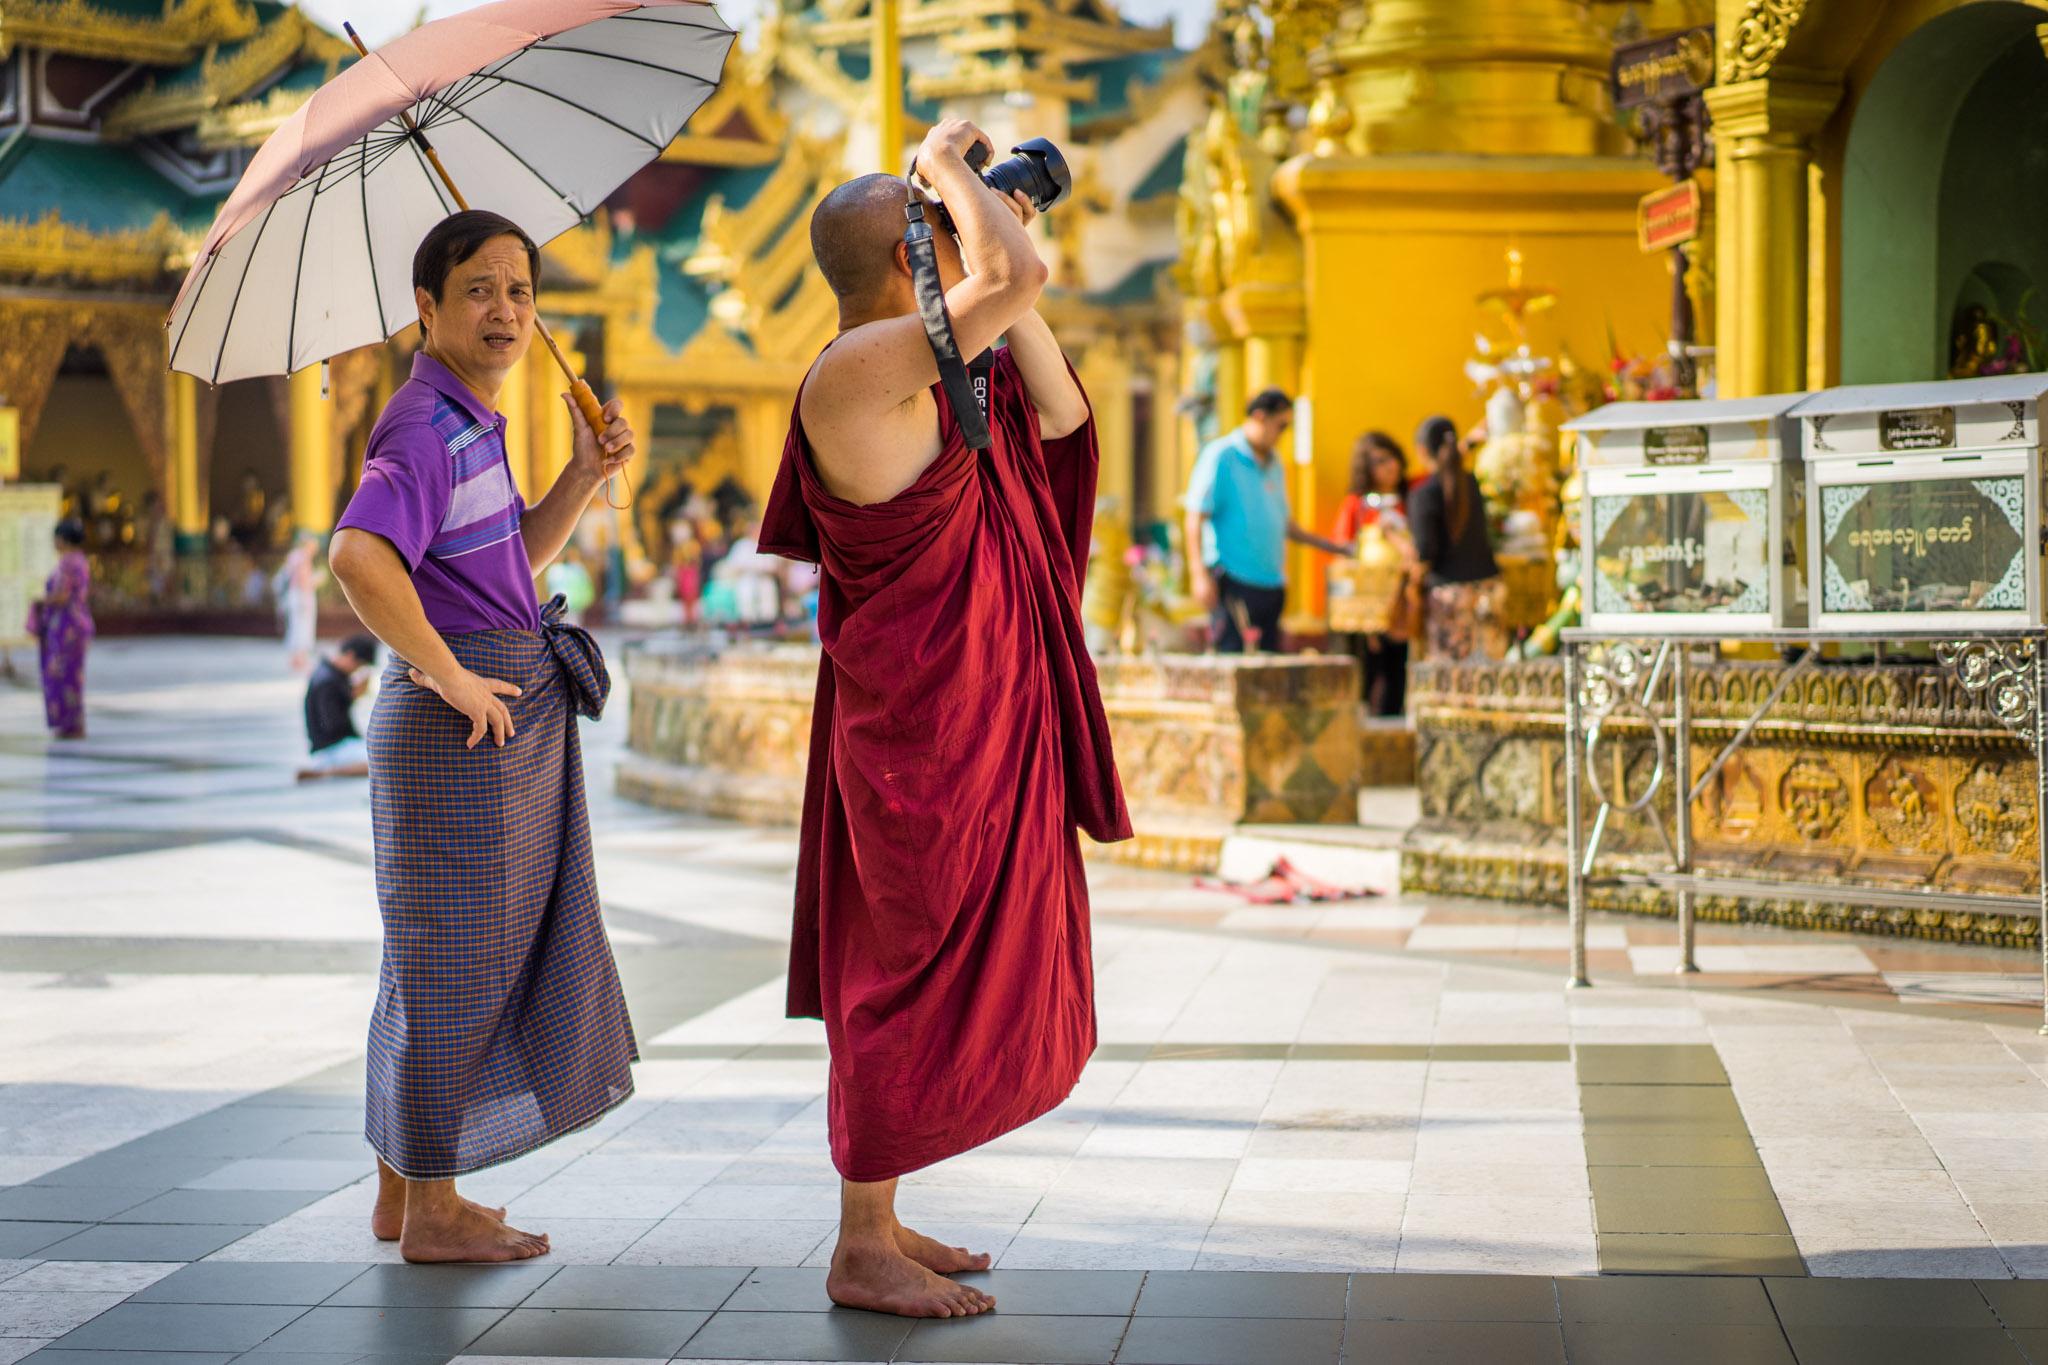 Moine photographe bouddhiste 5D